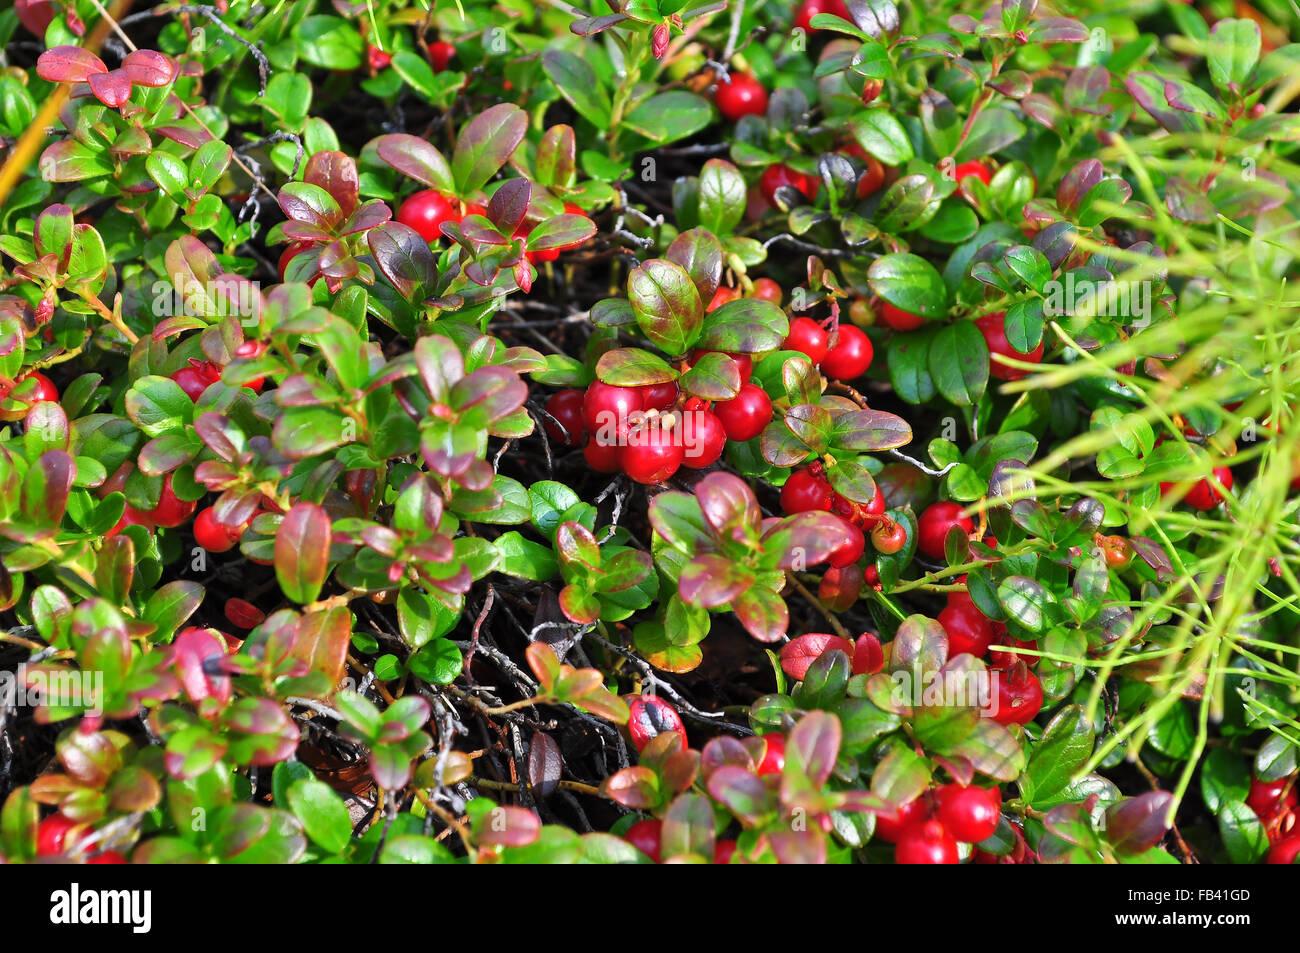 Ripe cowberries on the bushes. Ripe berries in summer vegetation ...